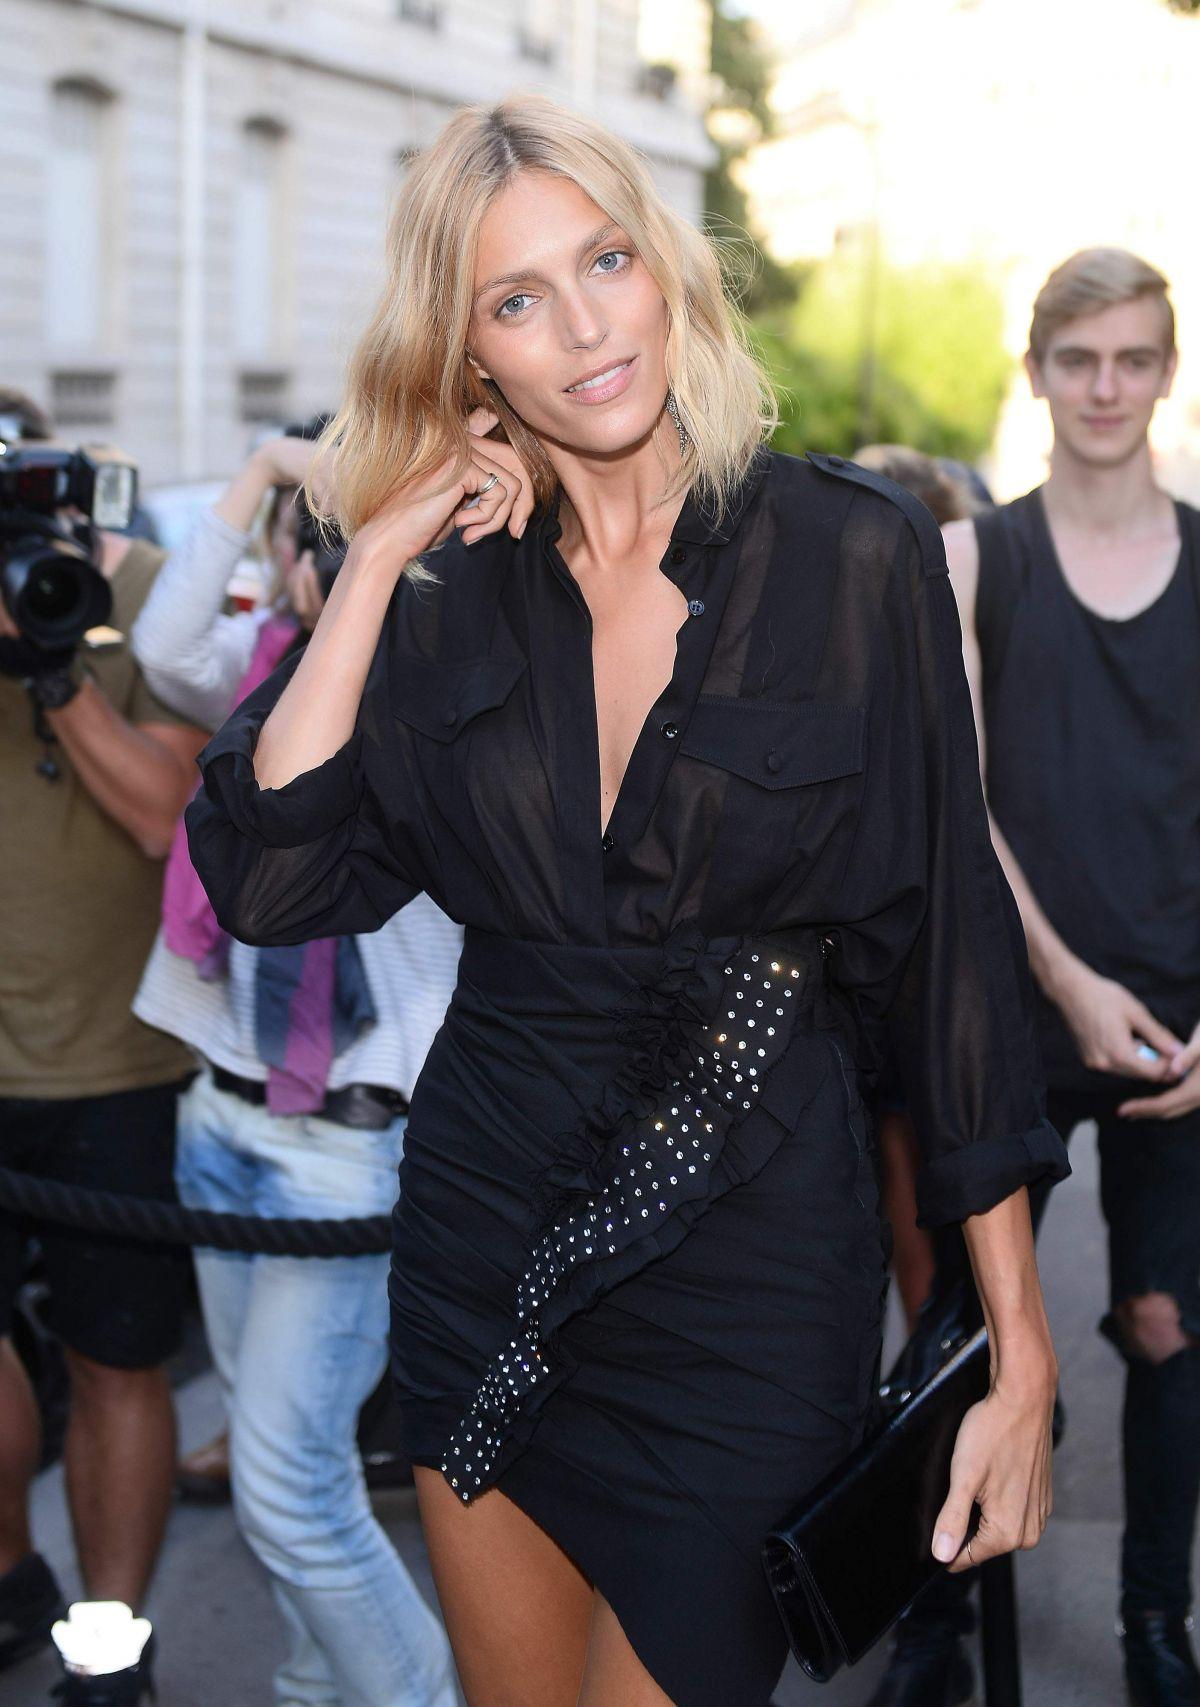 ANJA RUBIK at Vogue Party at Paris Fashion Week 07/04/2017